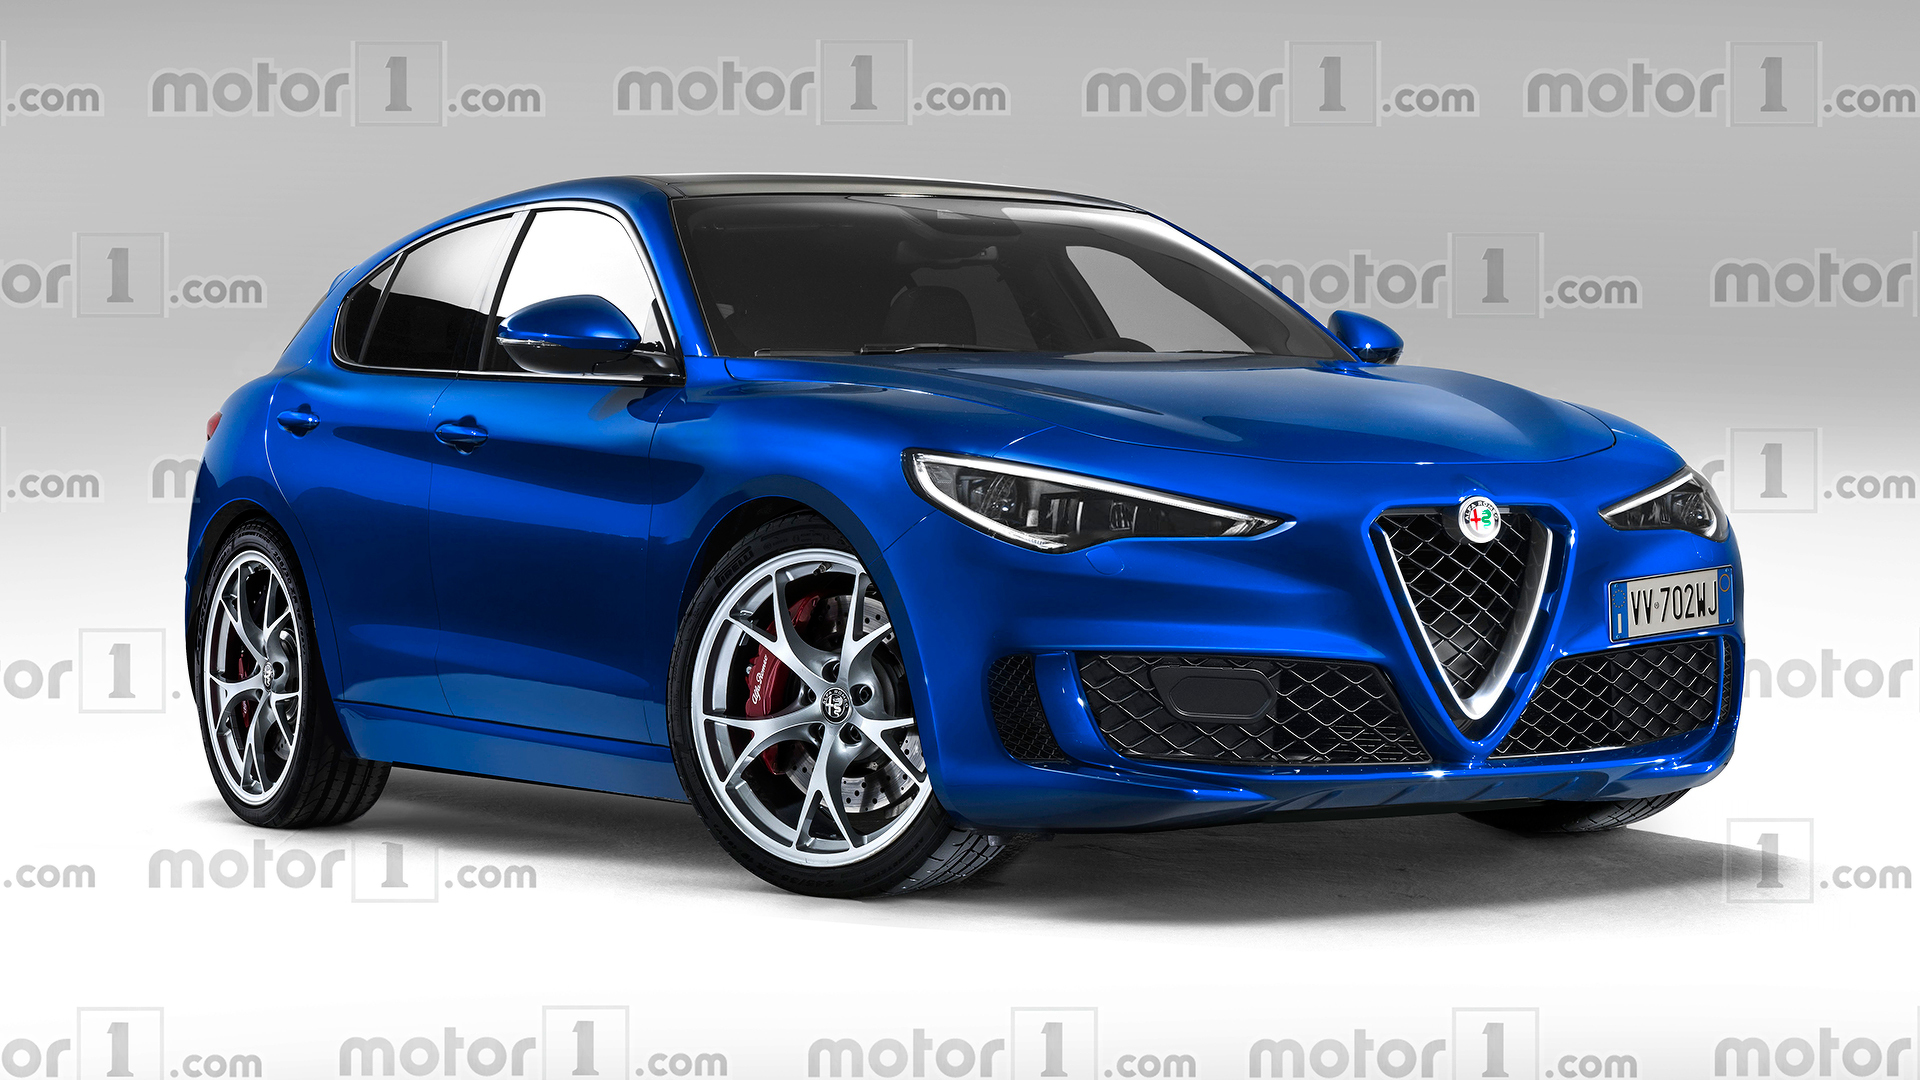 Alfa Romeo Giulietta >> Alfa Romeo Giulietta Render Imagines Model S Future Beyond 2022